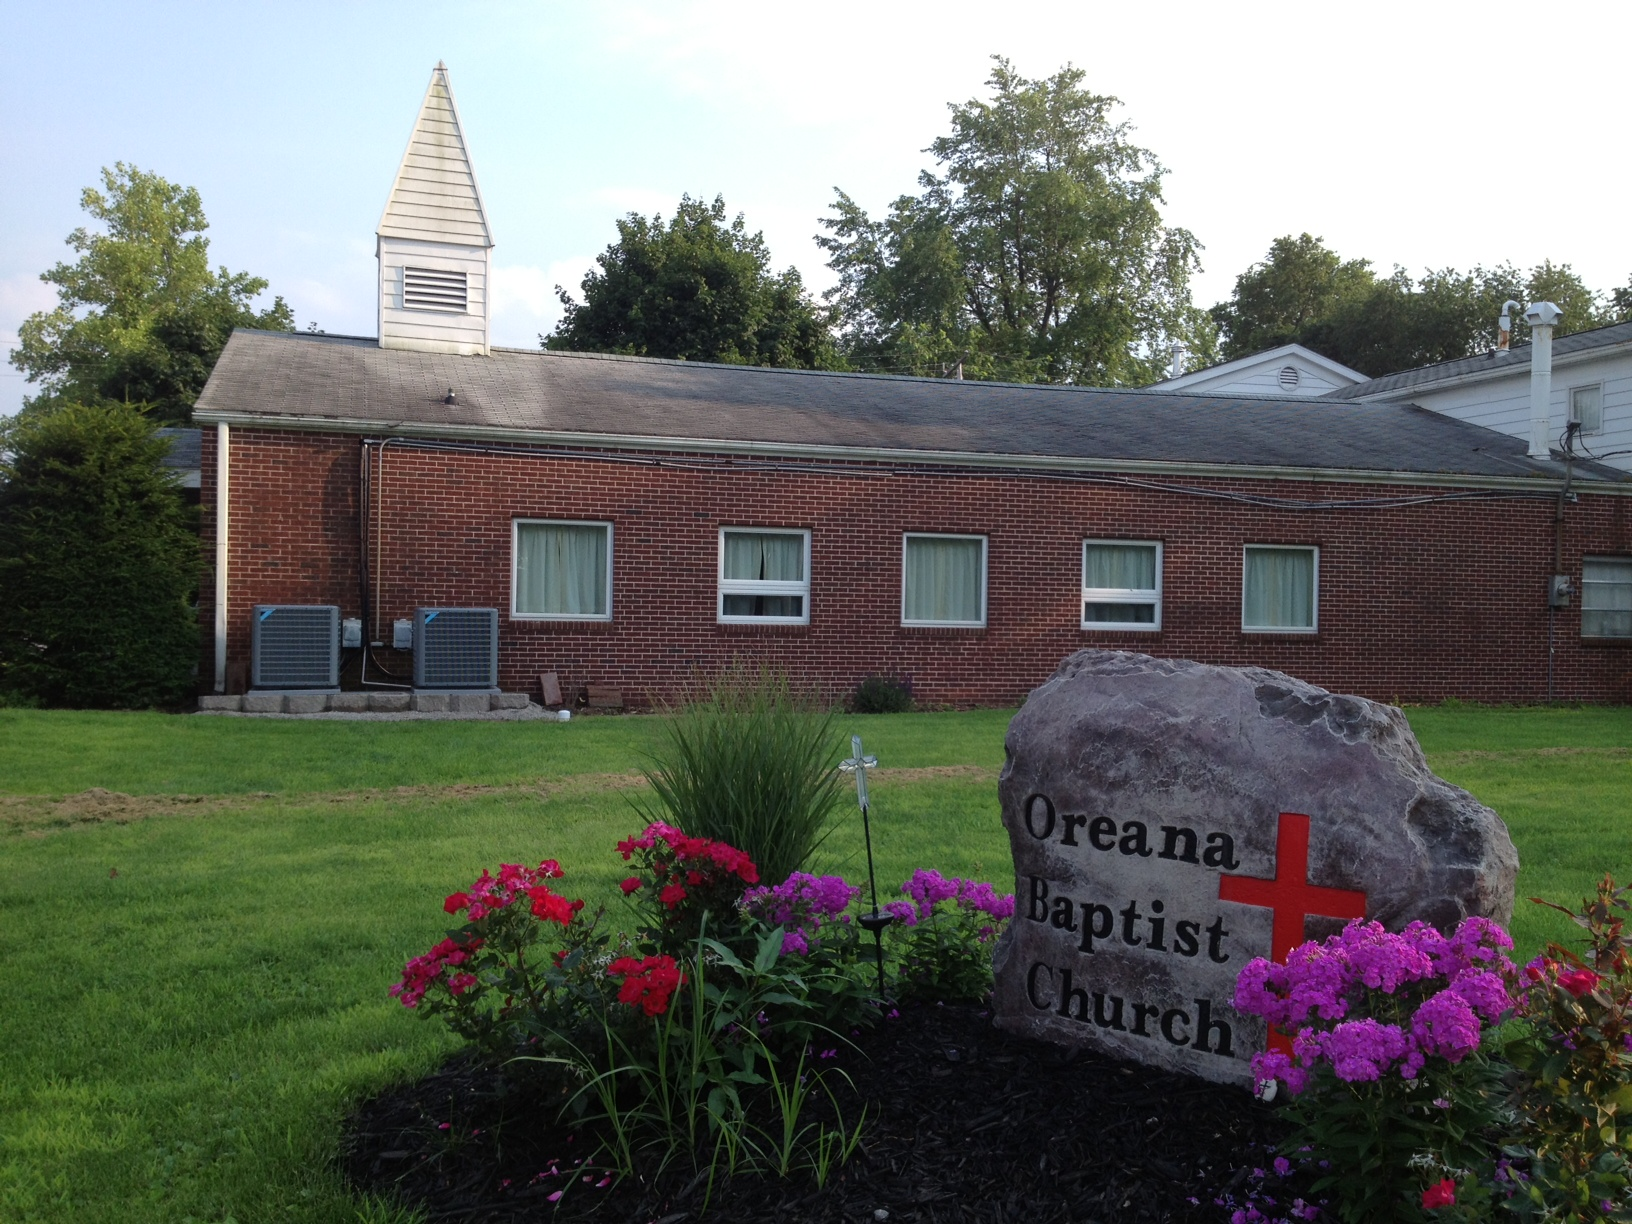 Oreana Baptist Church